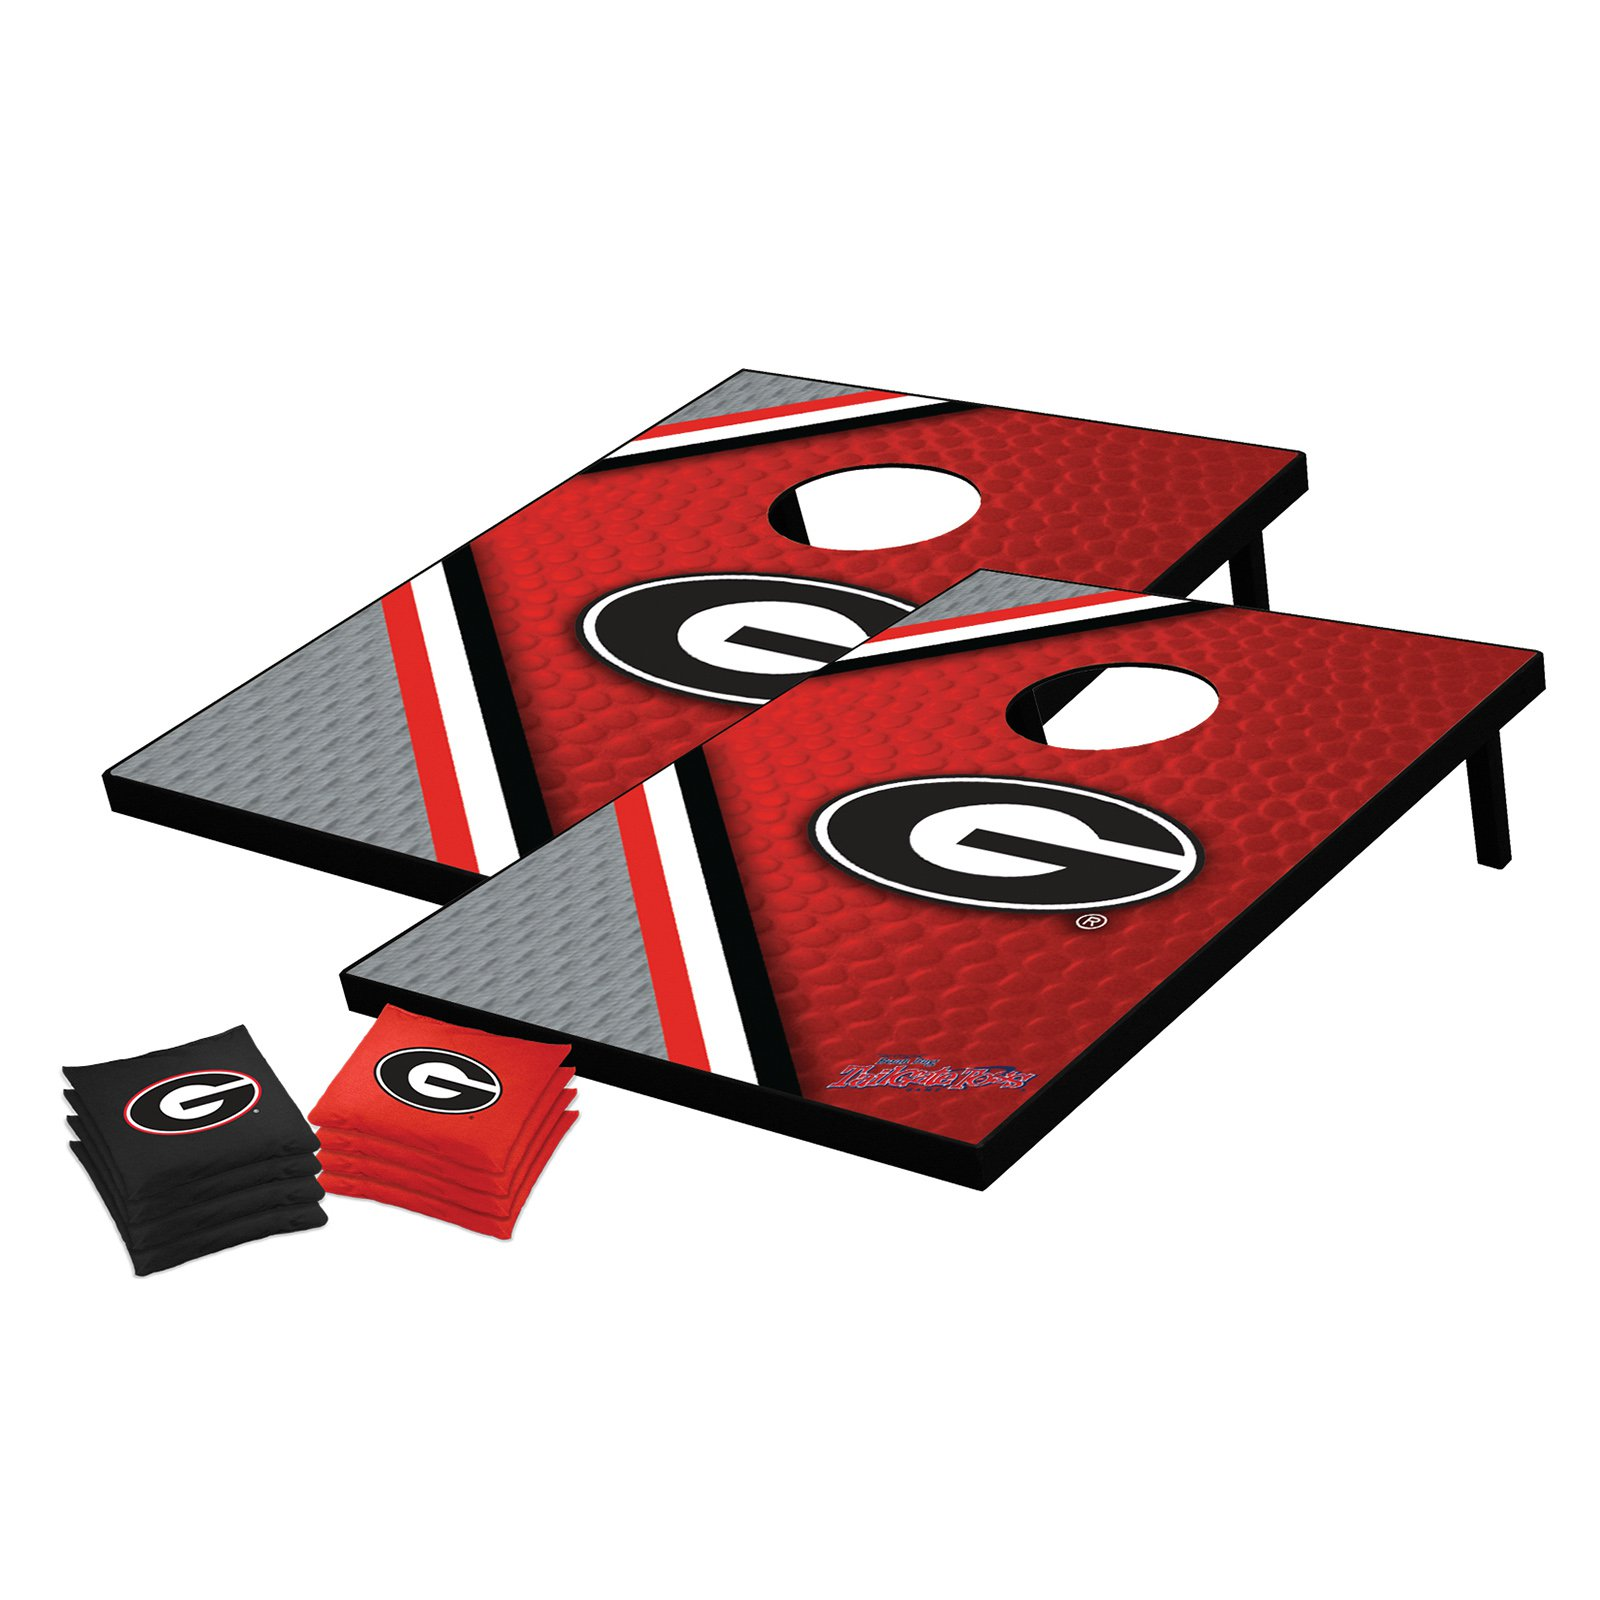 Wild Sports Tailgate NCAA Toss Cornhole Bean Bag Game Set